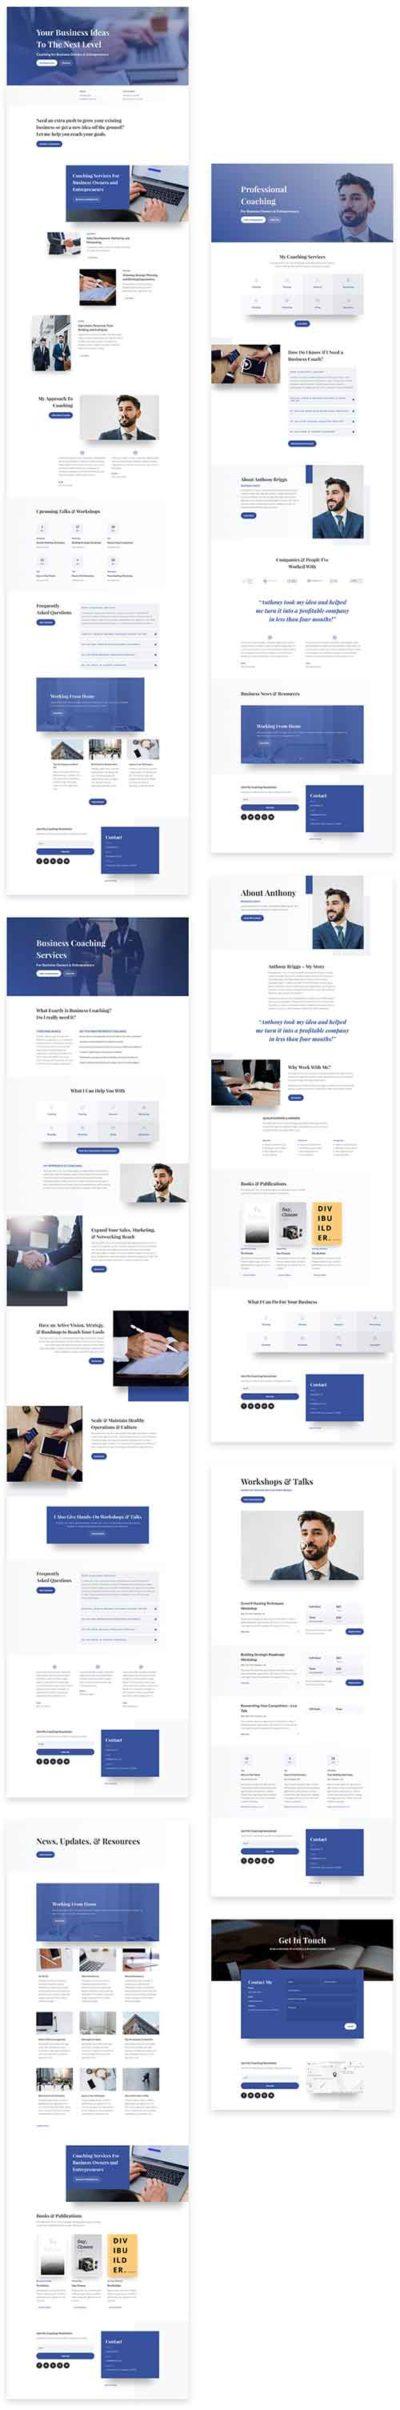 divi business coach layout pack